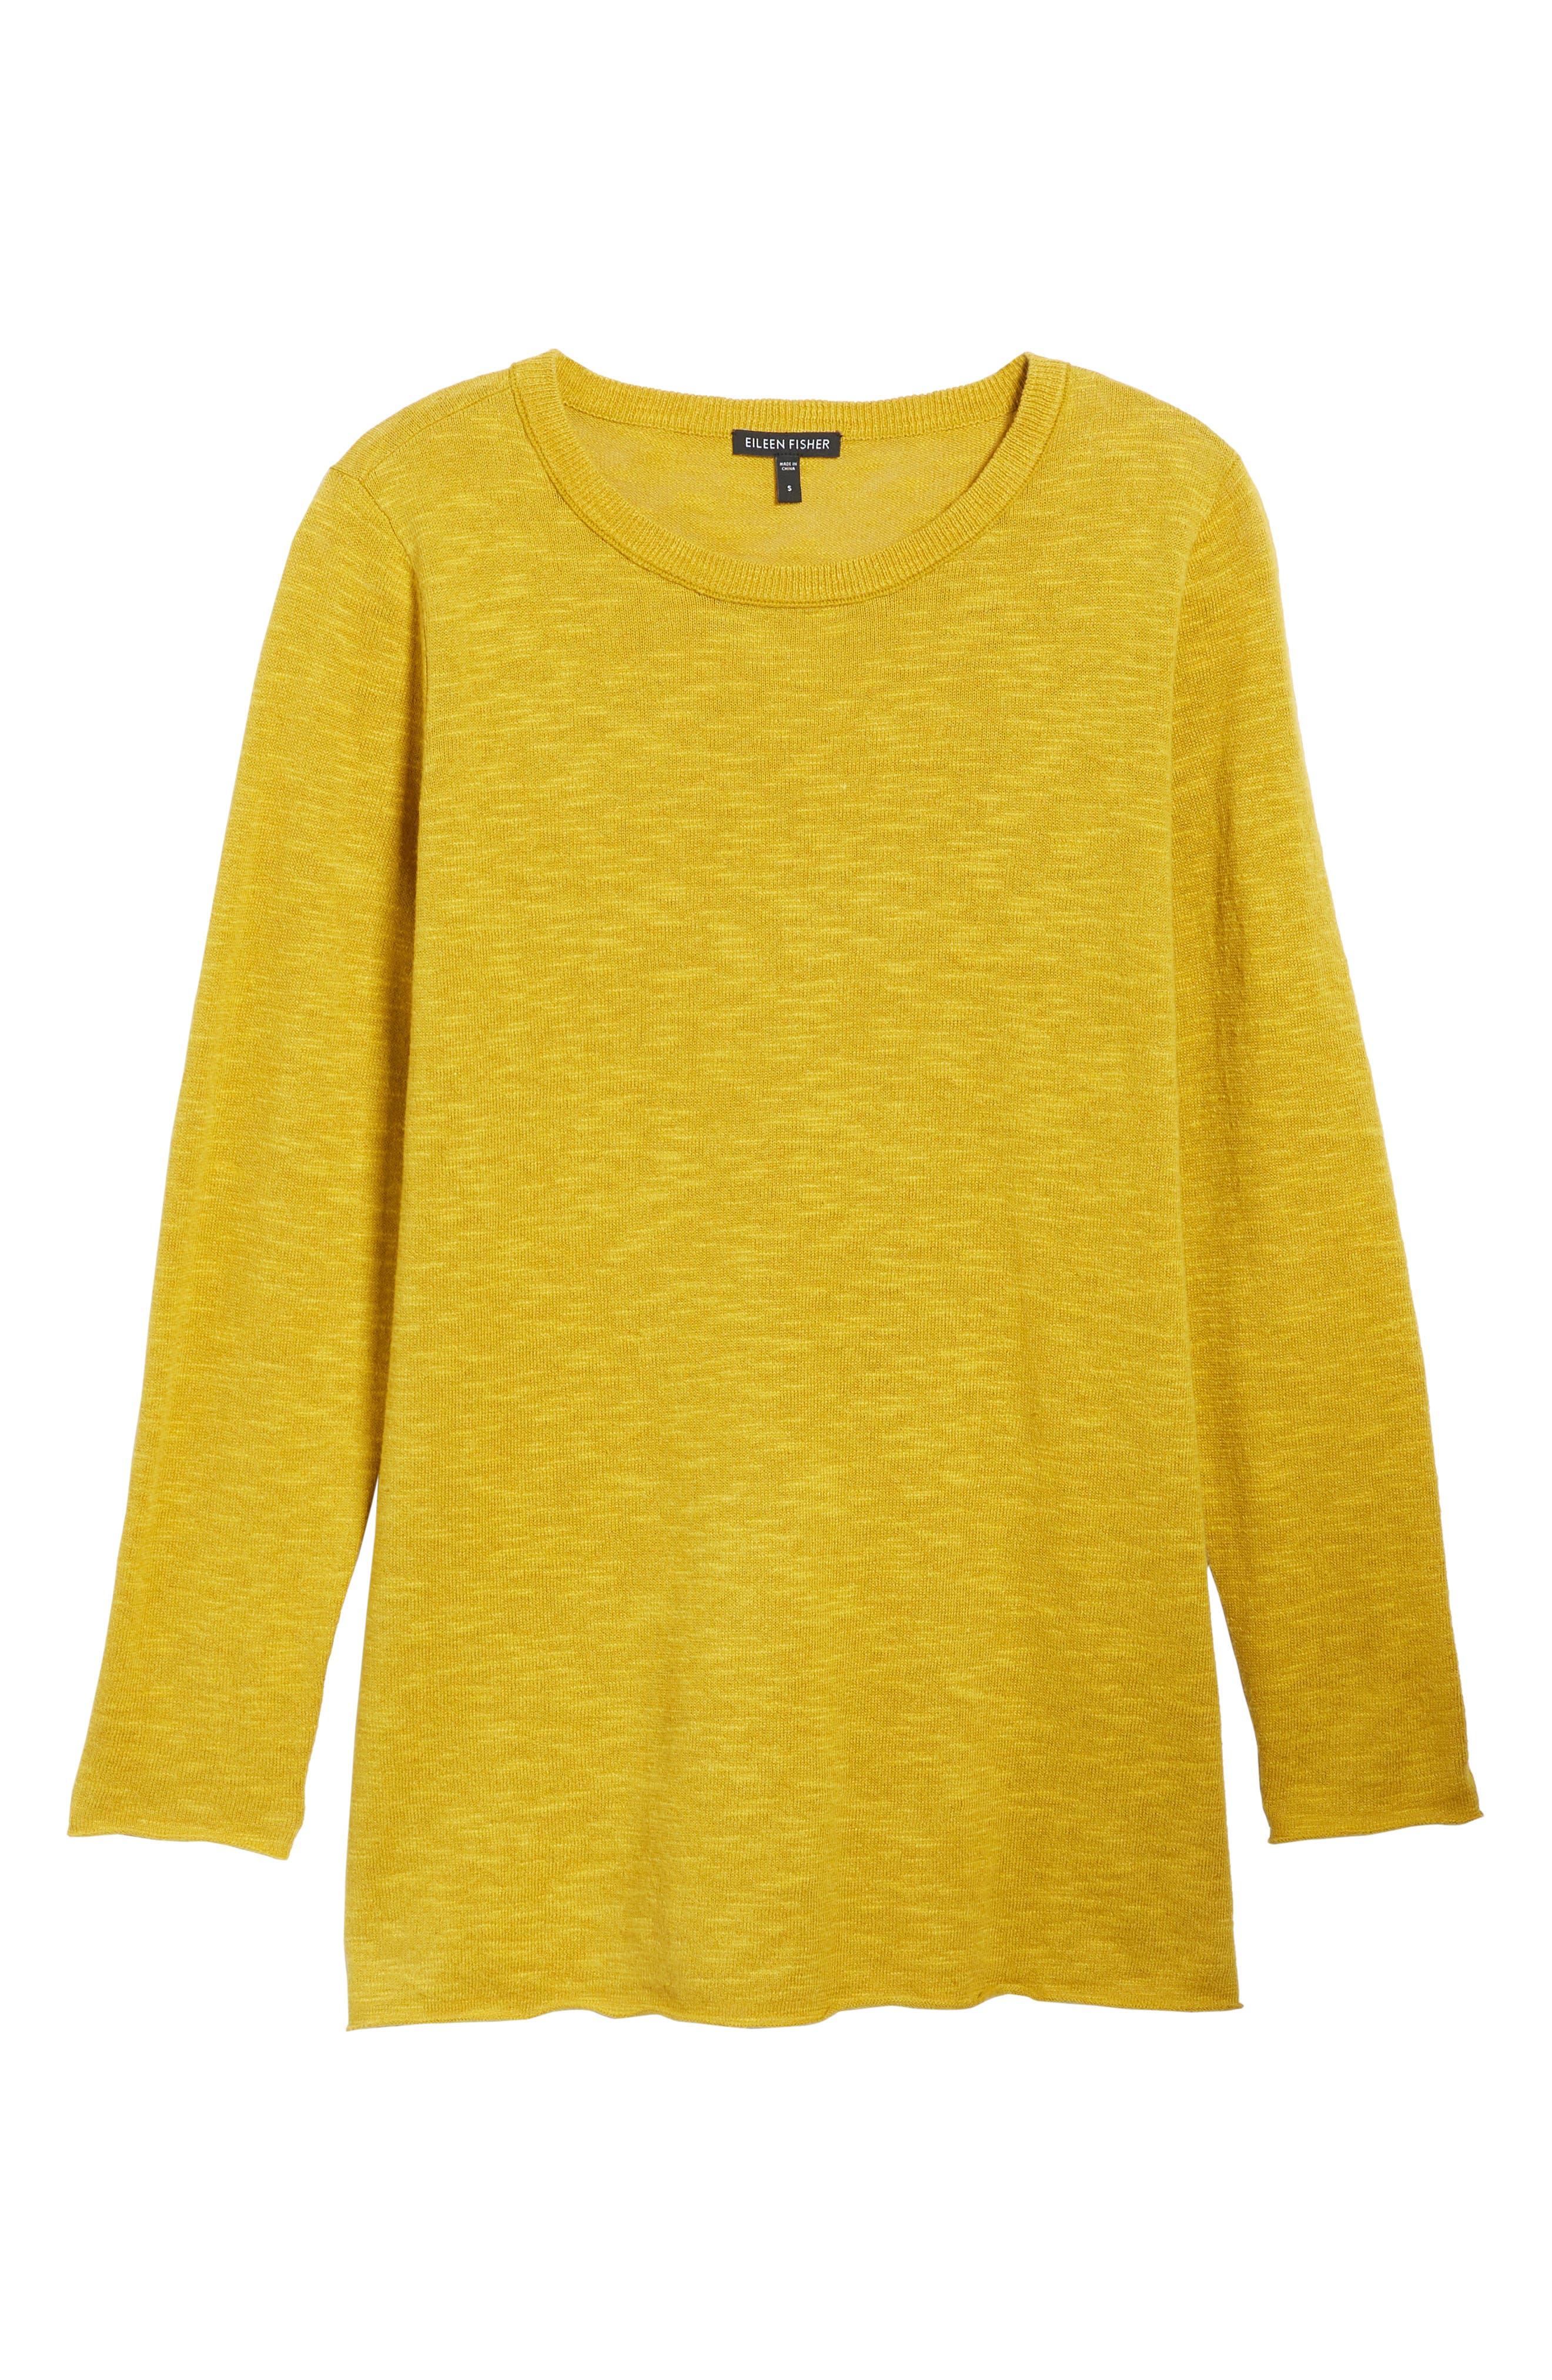 Organic Knit Crewneck Tunic Top,                             Alternate thumbnail 6, color,                             Mustard Seed